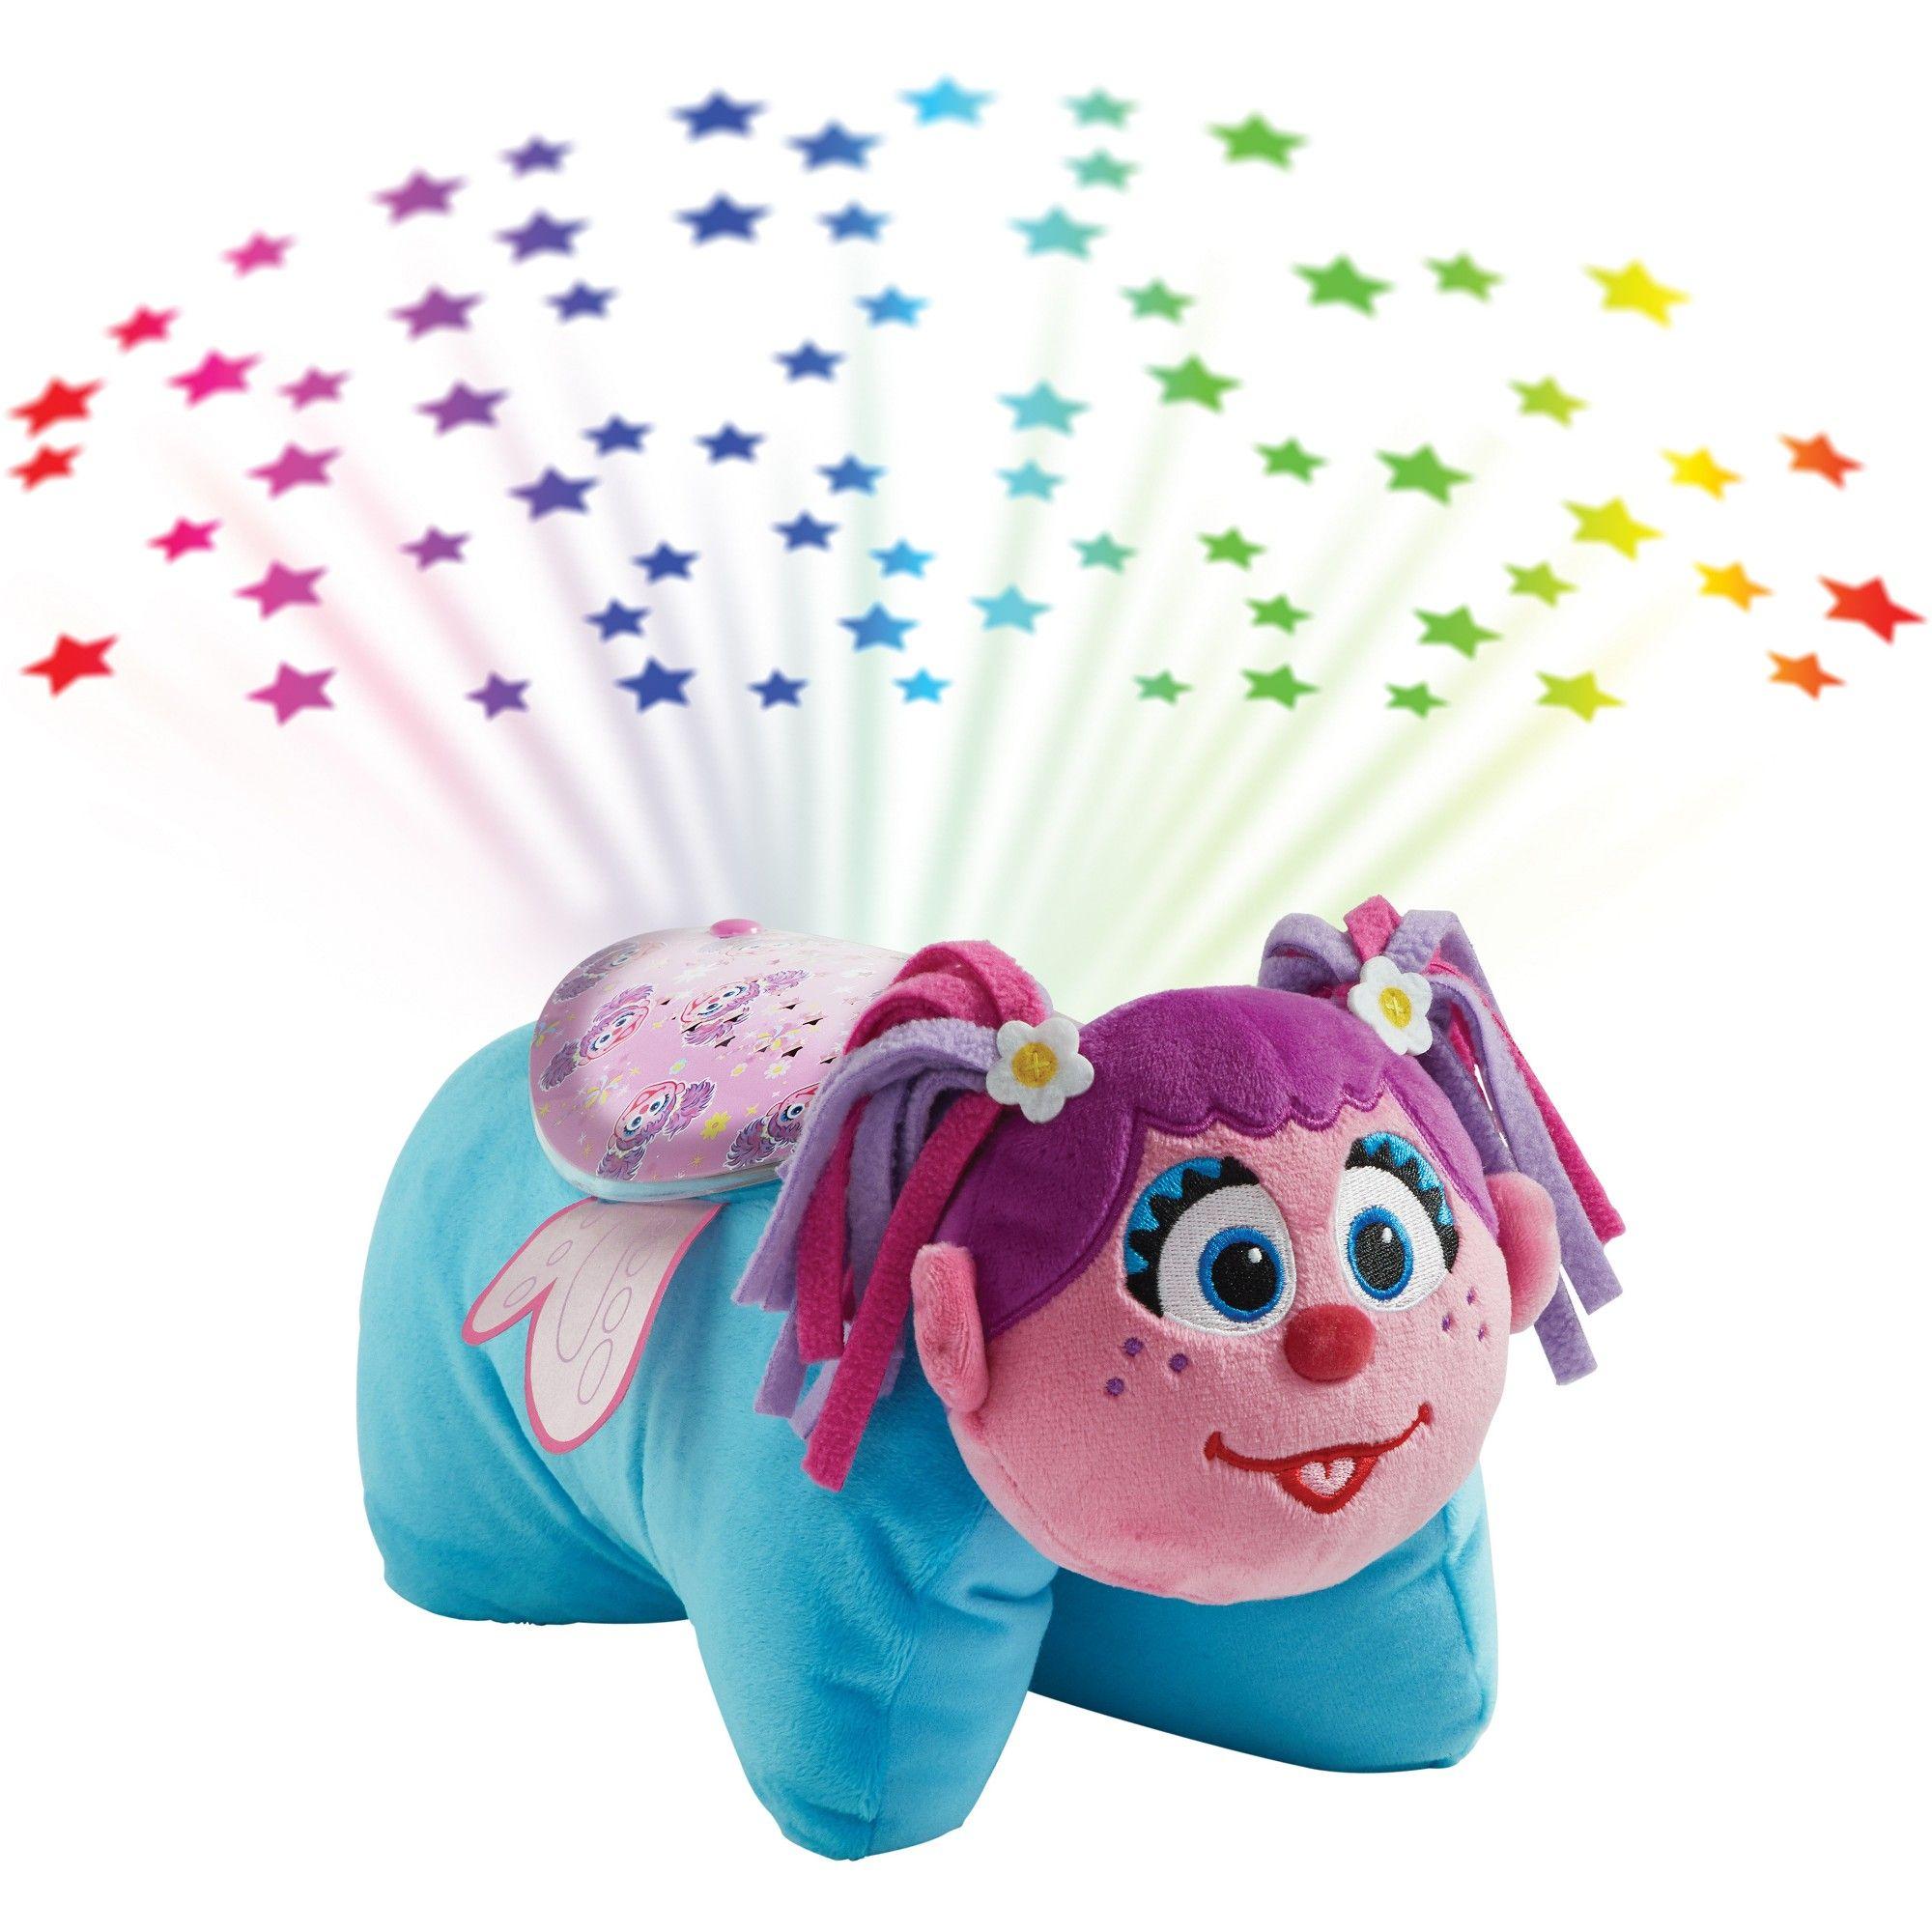 Sesame Street Sleeptime Lites Abby Cadabby Plush Night Light Pink Pillow Pets Animal Pillows Light Pink Pillows Pink Pillows